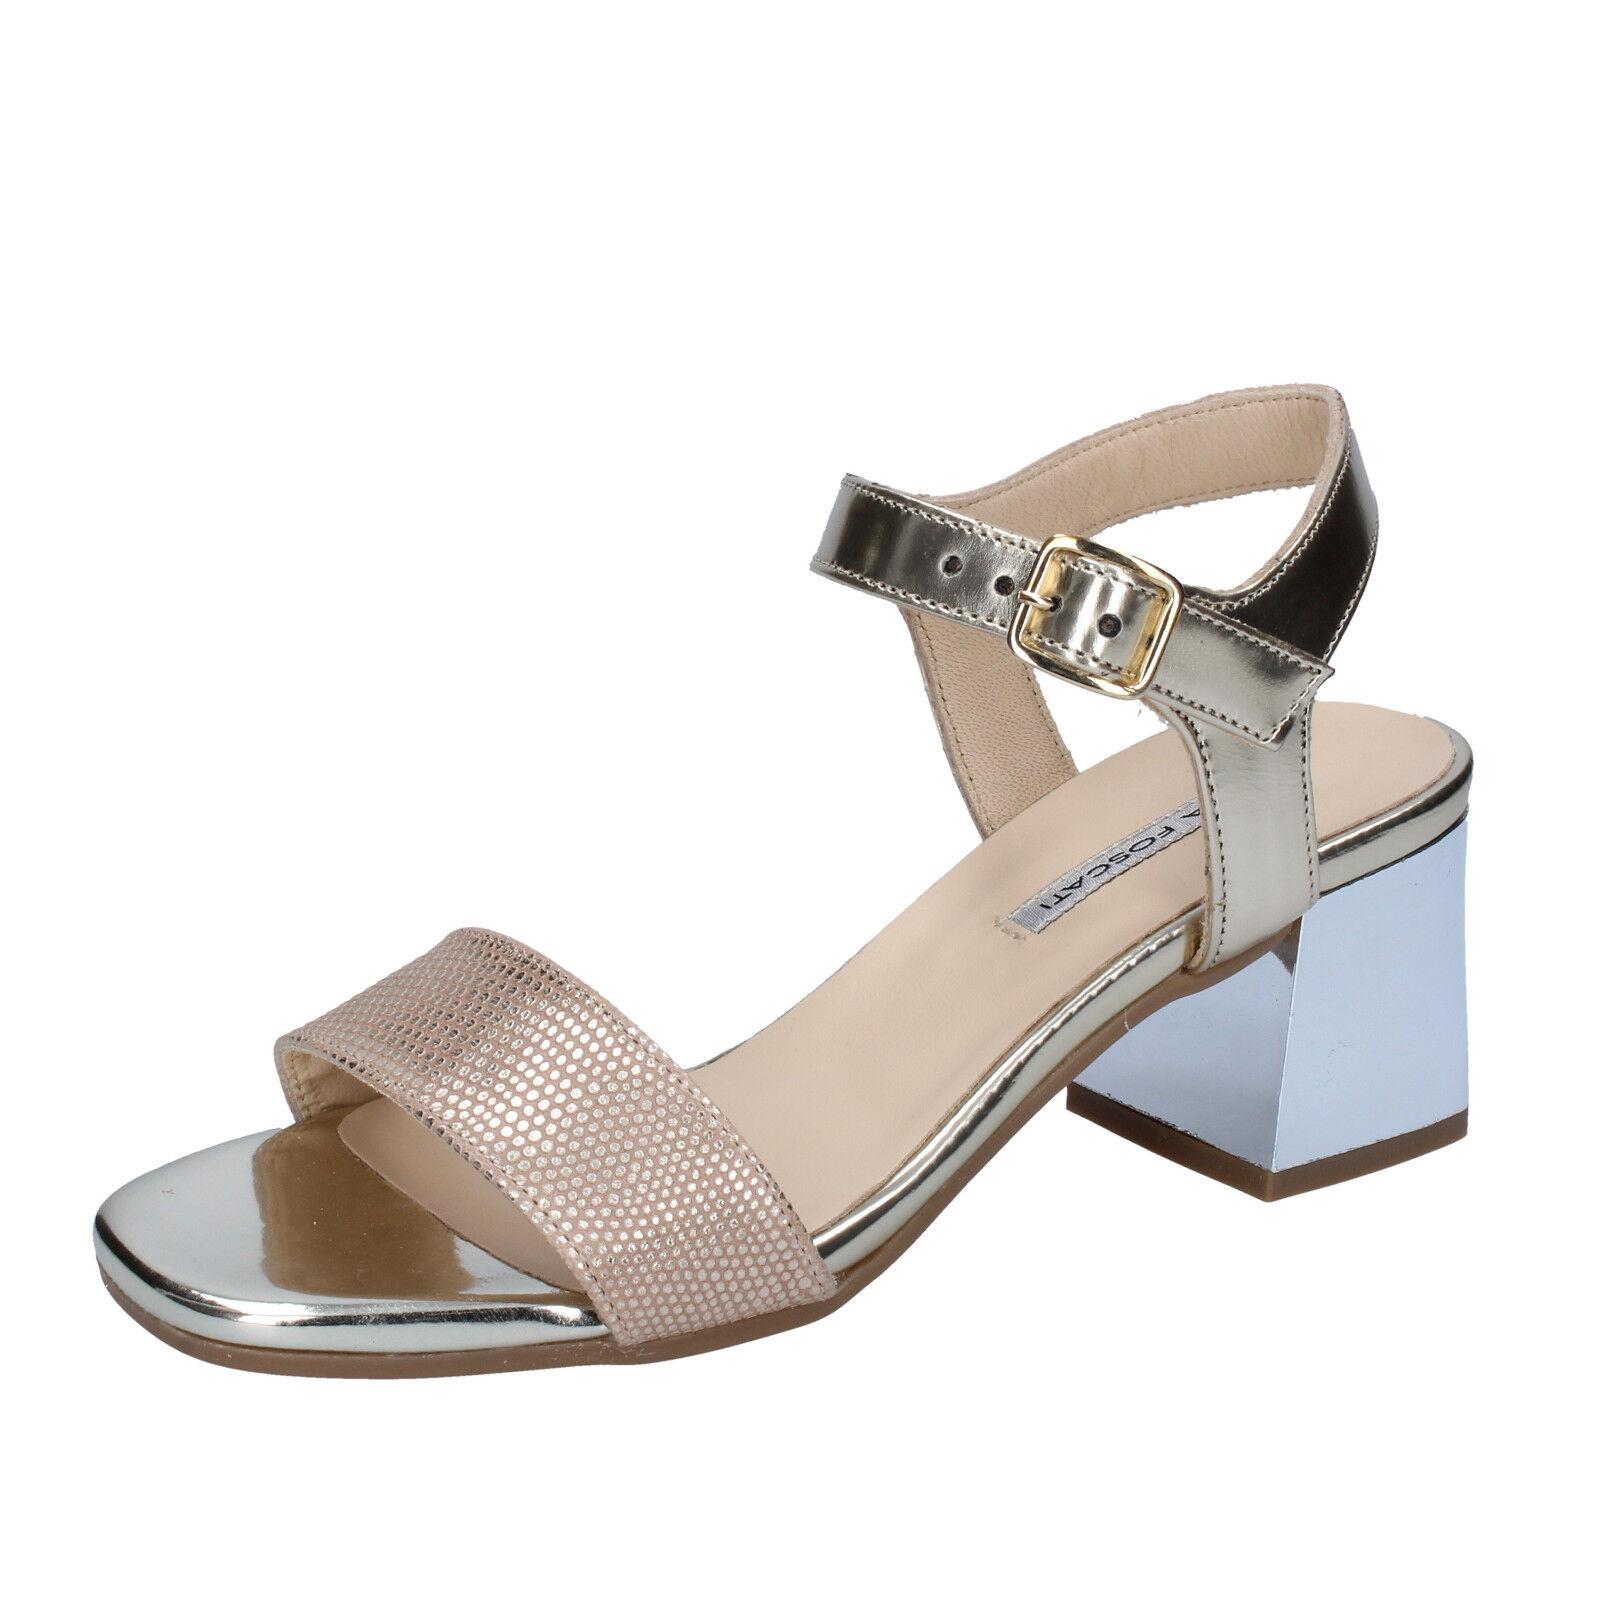 Scarpe donna LEA platino FOSCATI 35 EU sandali platino LEA pelle lucida BZ658-B fb31d1